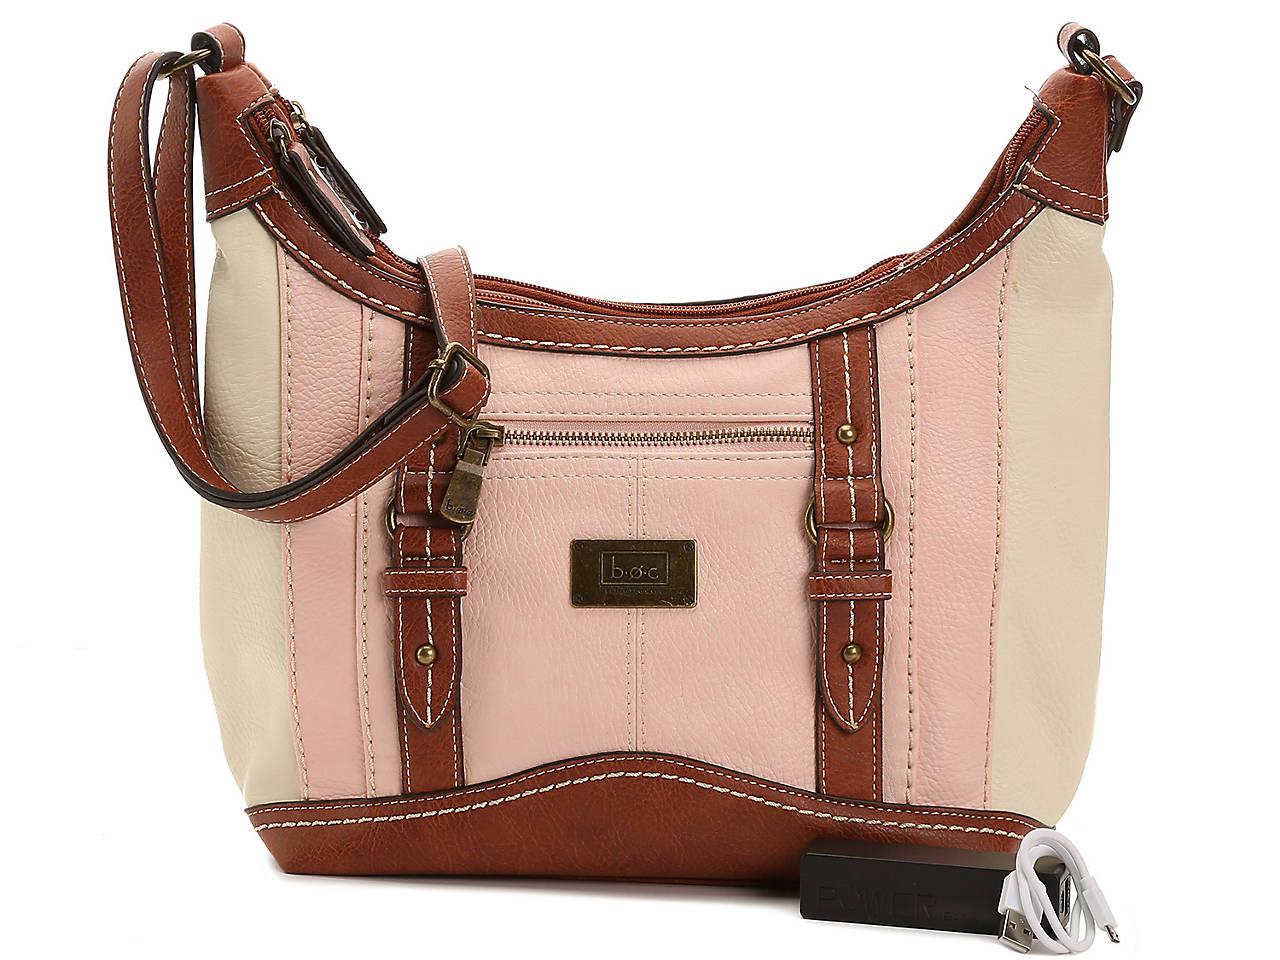 b.o.c Crocket Crossbody Bag Women s Handbags   Accessories  c56ab5b89f96f